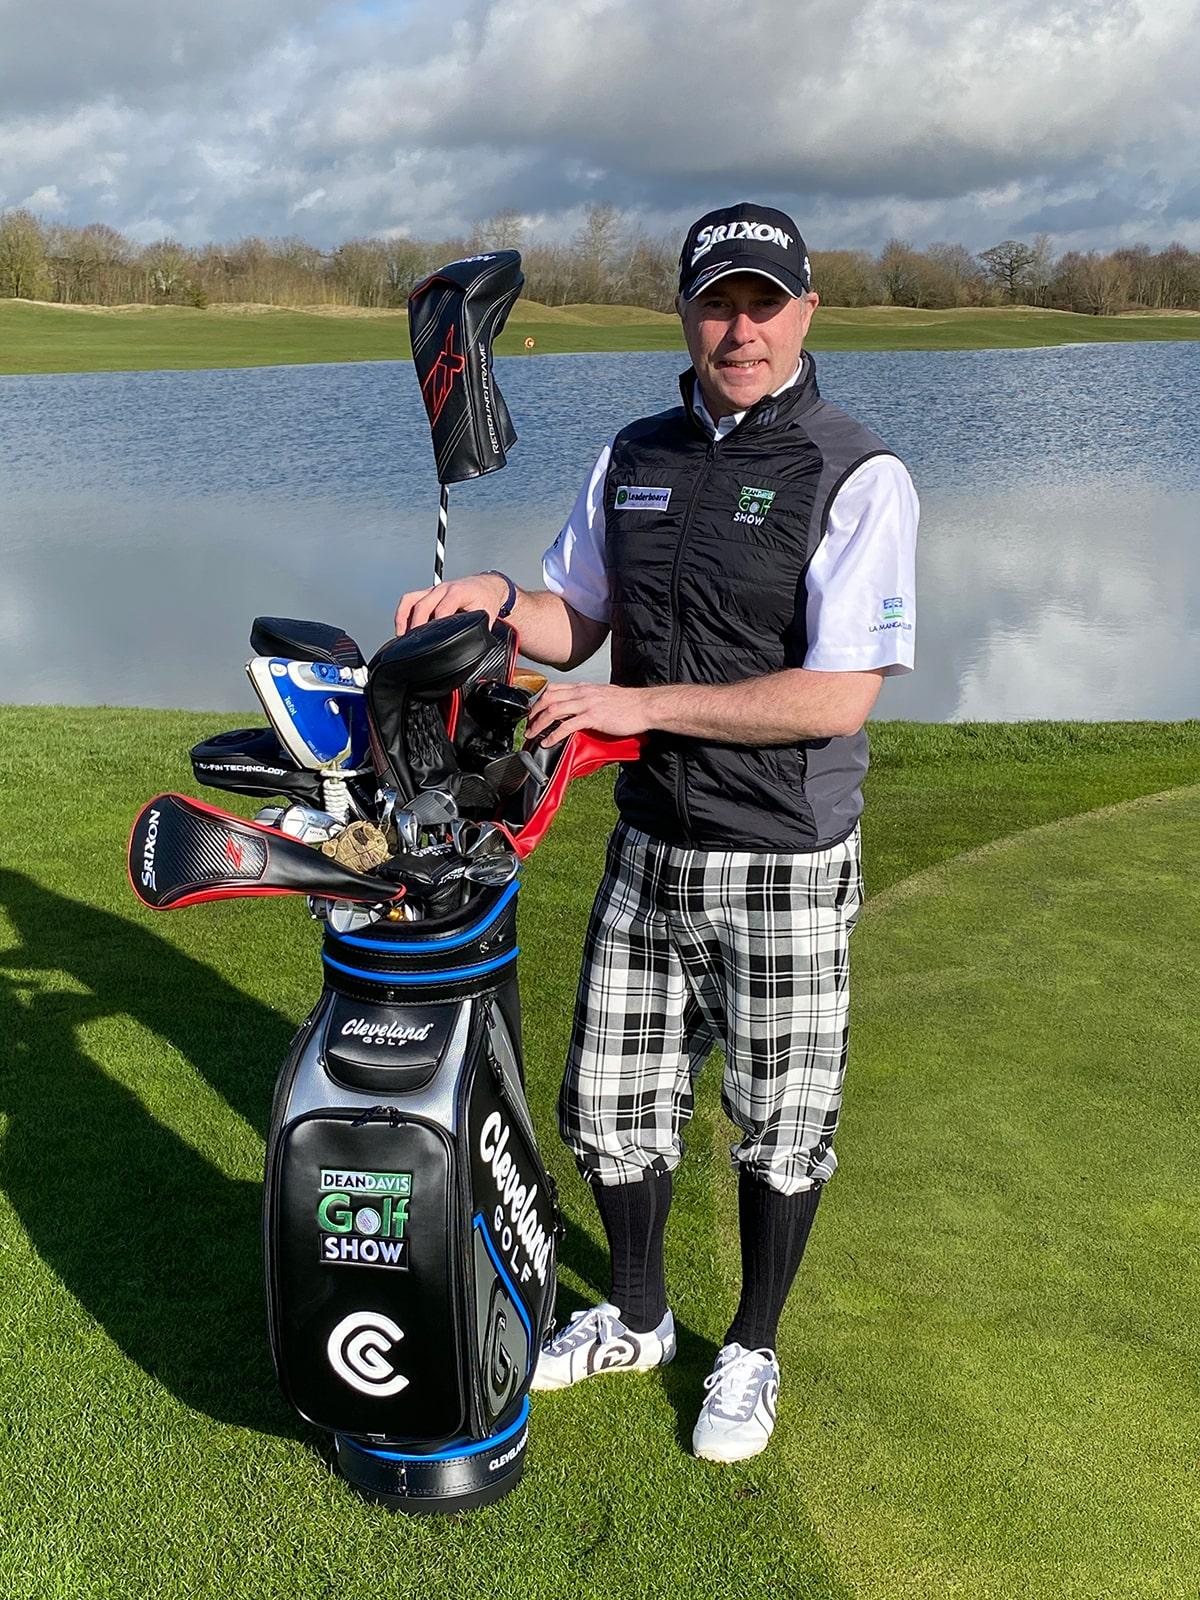 New Tricks for Dean Davis | Srixon & Cleveland Ambassador | Best Golf Trick Shot Artist